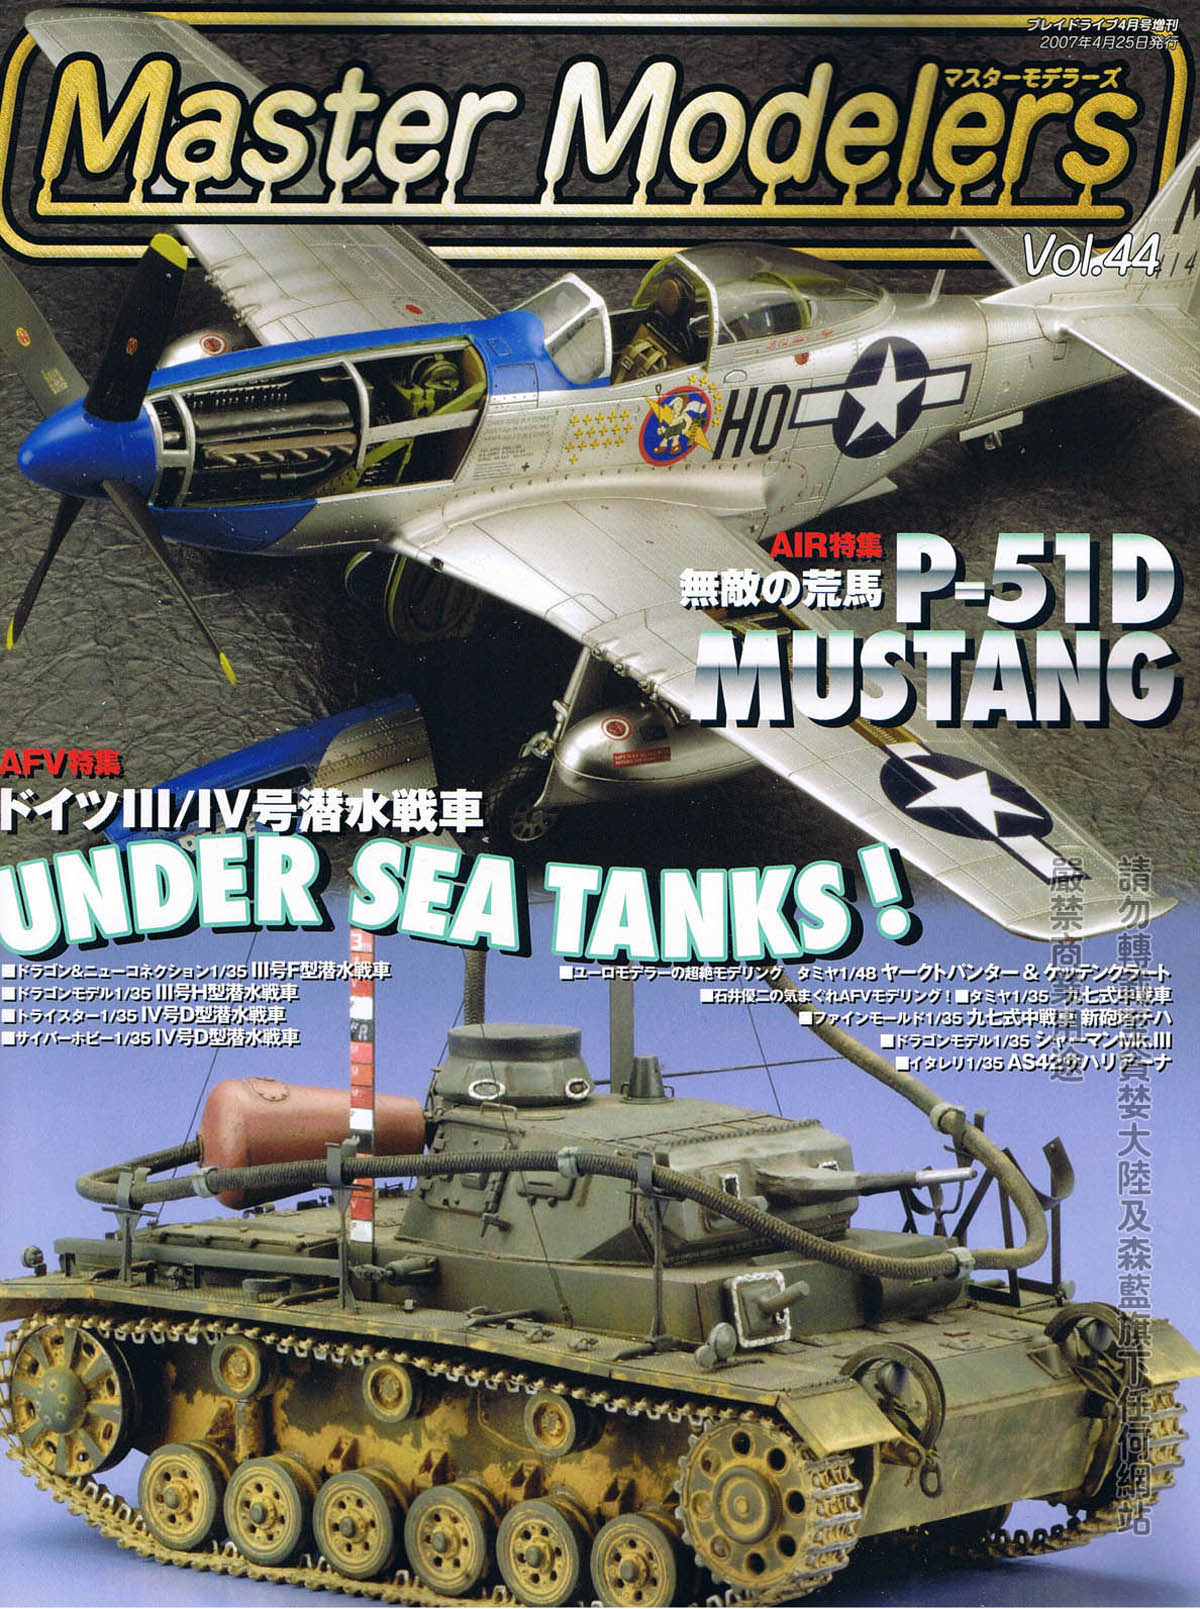 Master Modelers 44 [2007]